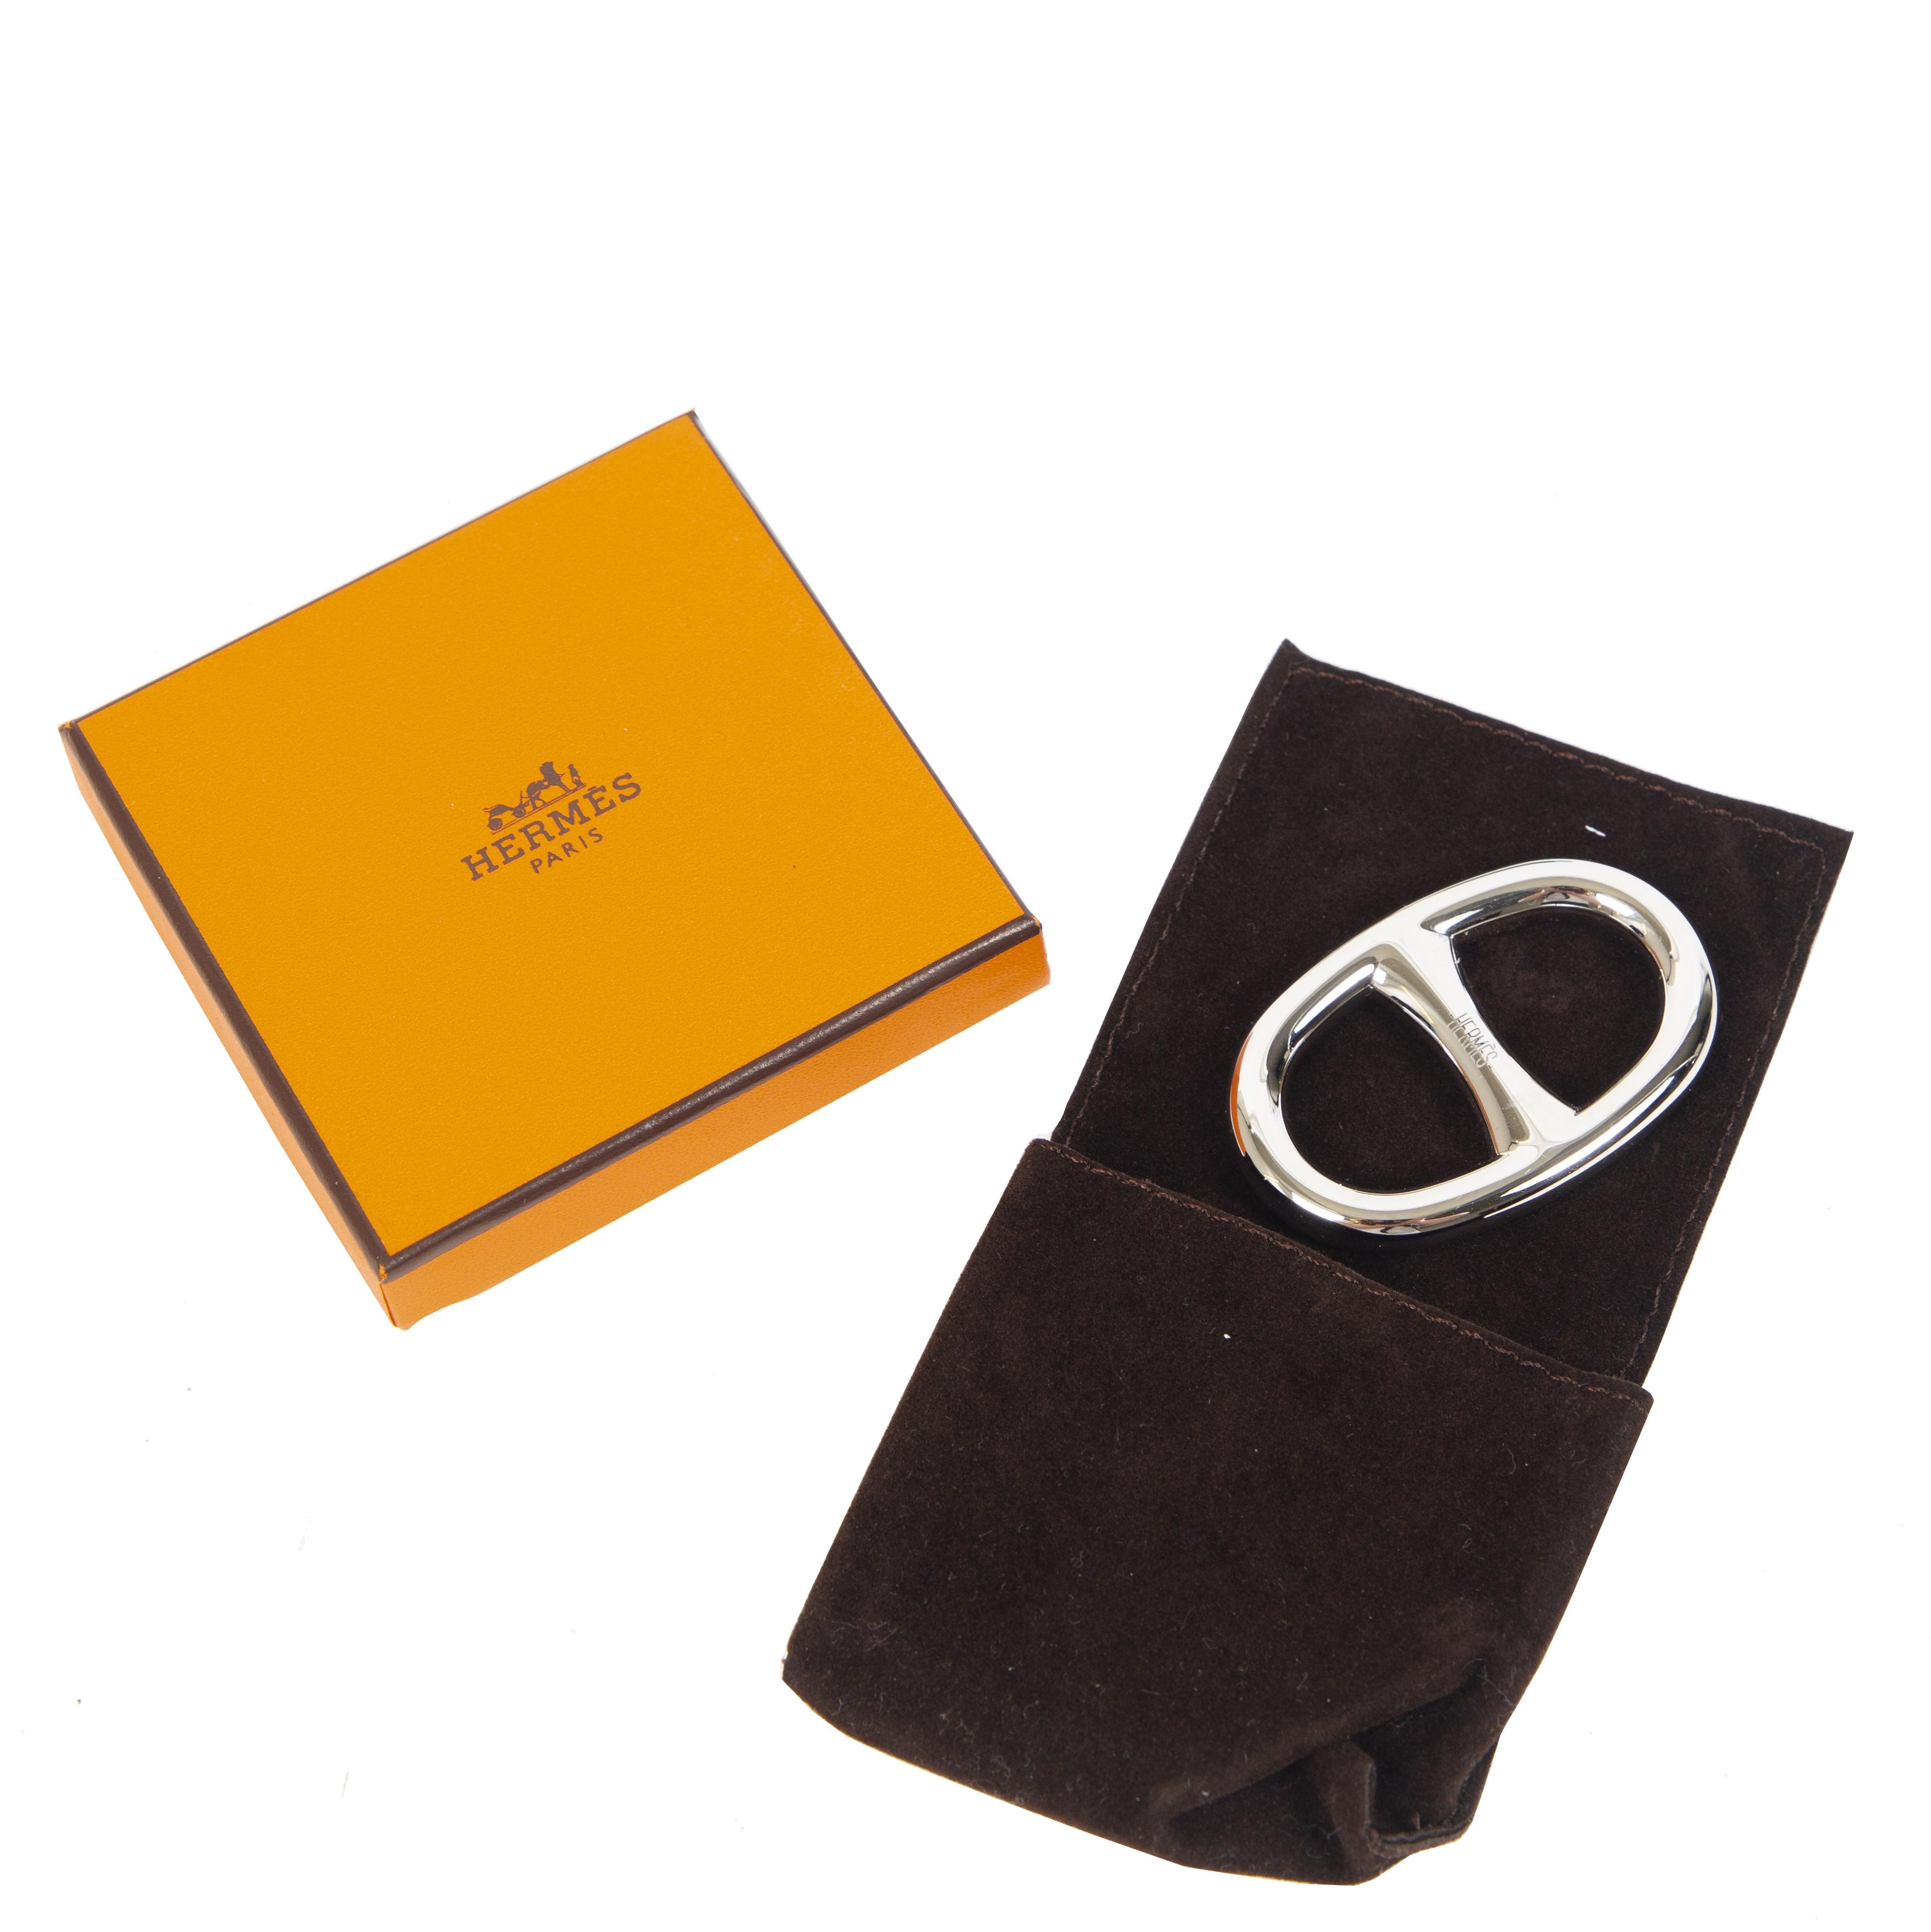 shop safe online Hermes Palladium Chaine d'Ancre Scarf Ring